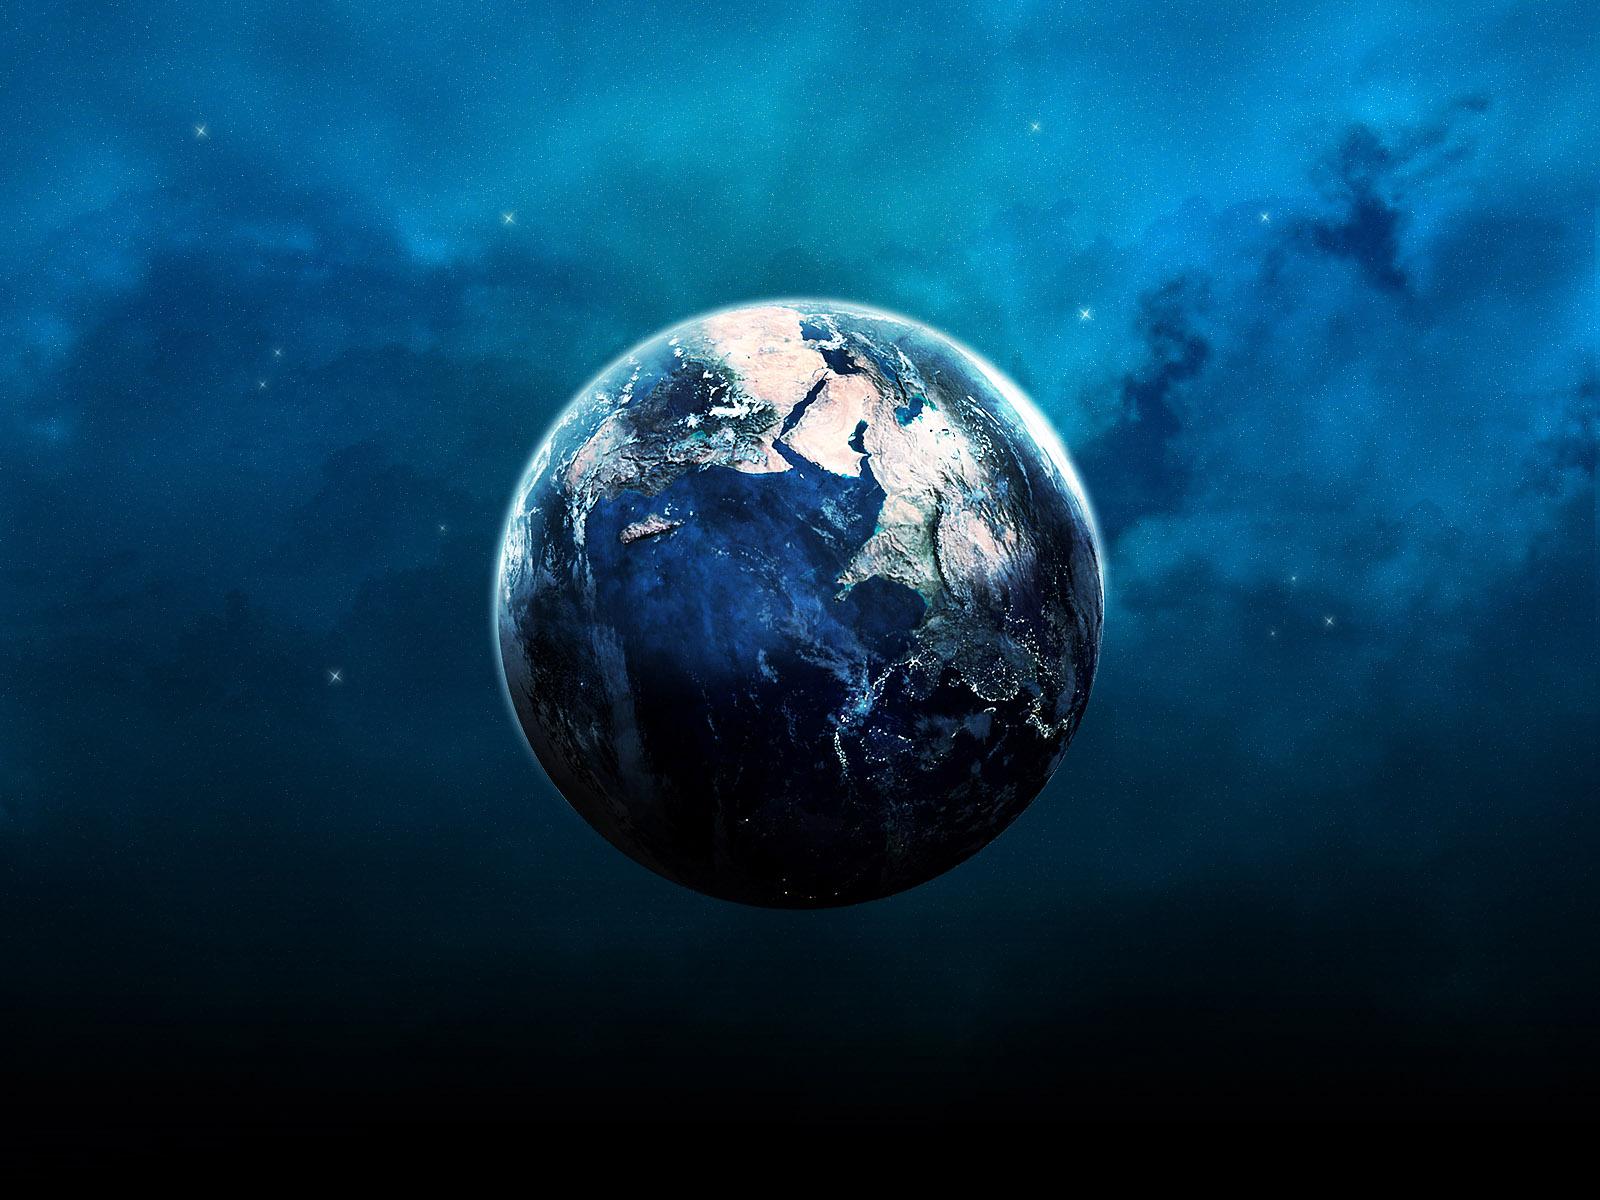 Hd Earth Wallpaper Widescreen Blue Earth Wallpapers Hd Wallpapers Id 3880